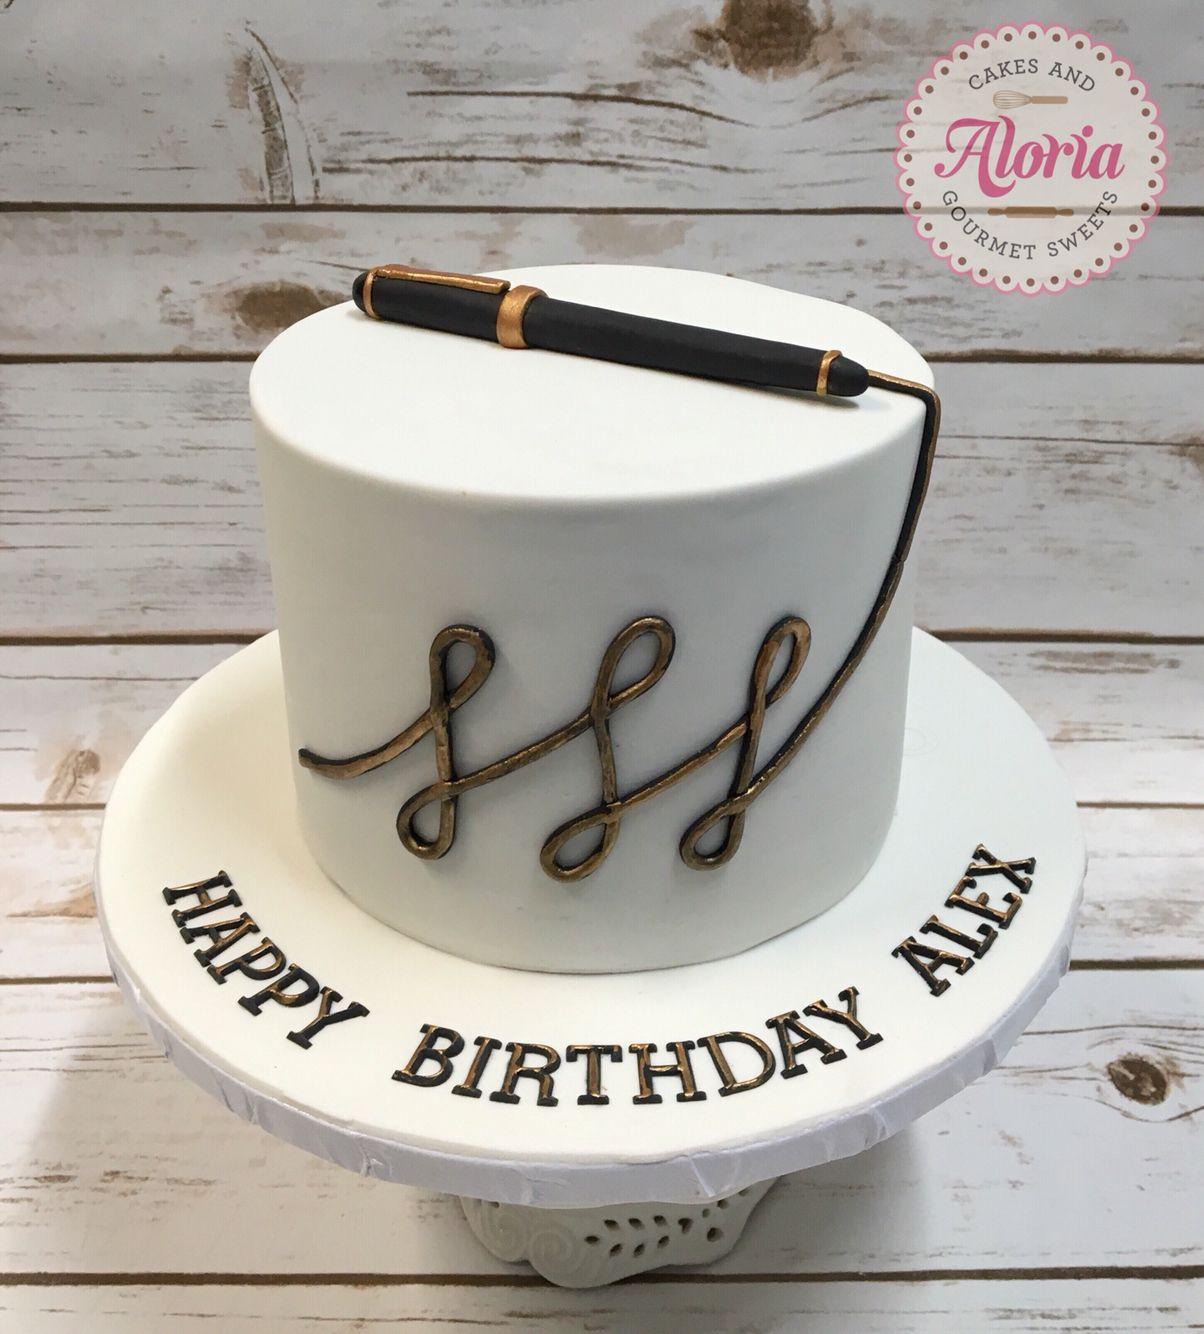 Wondrous Birthday Cake Grown Up Birthday Cake Fondant Pen With Images Funny Birthday Cards Online Benoljebrpdamsfinfo